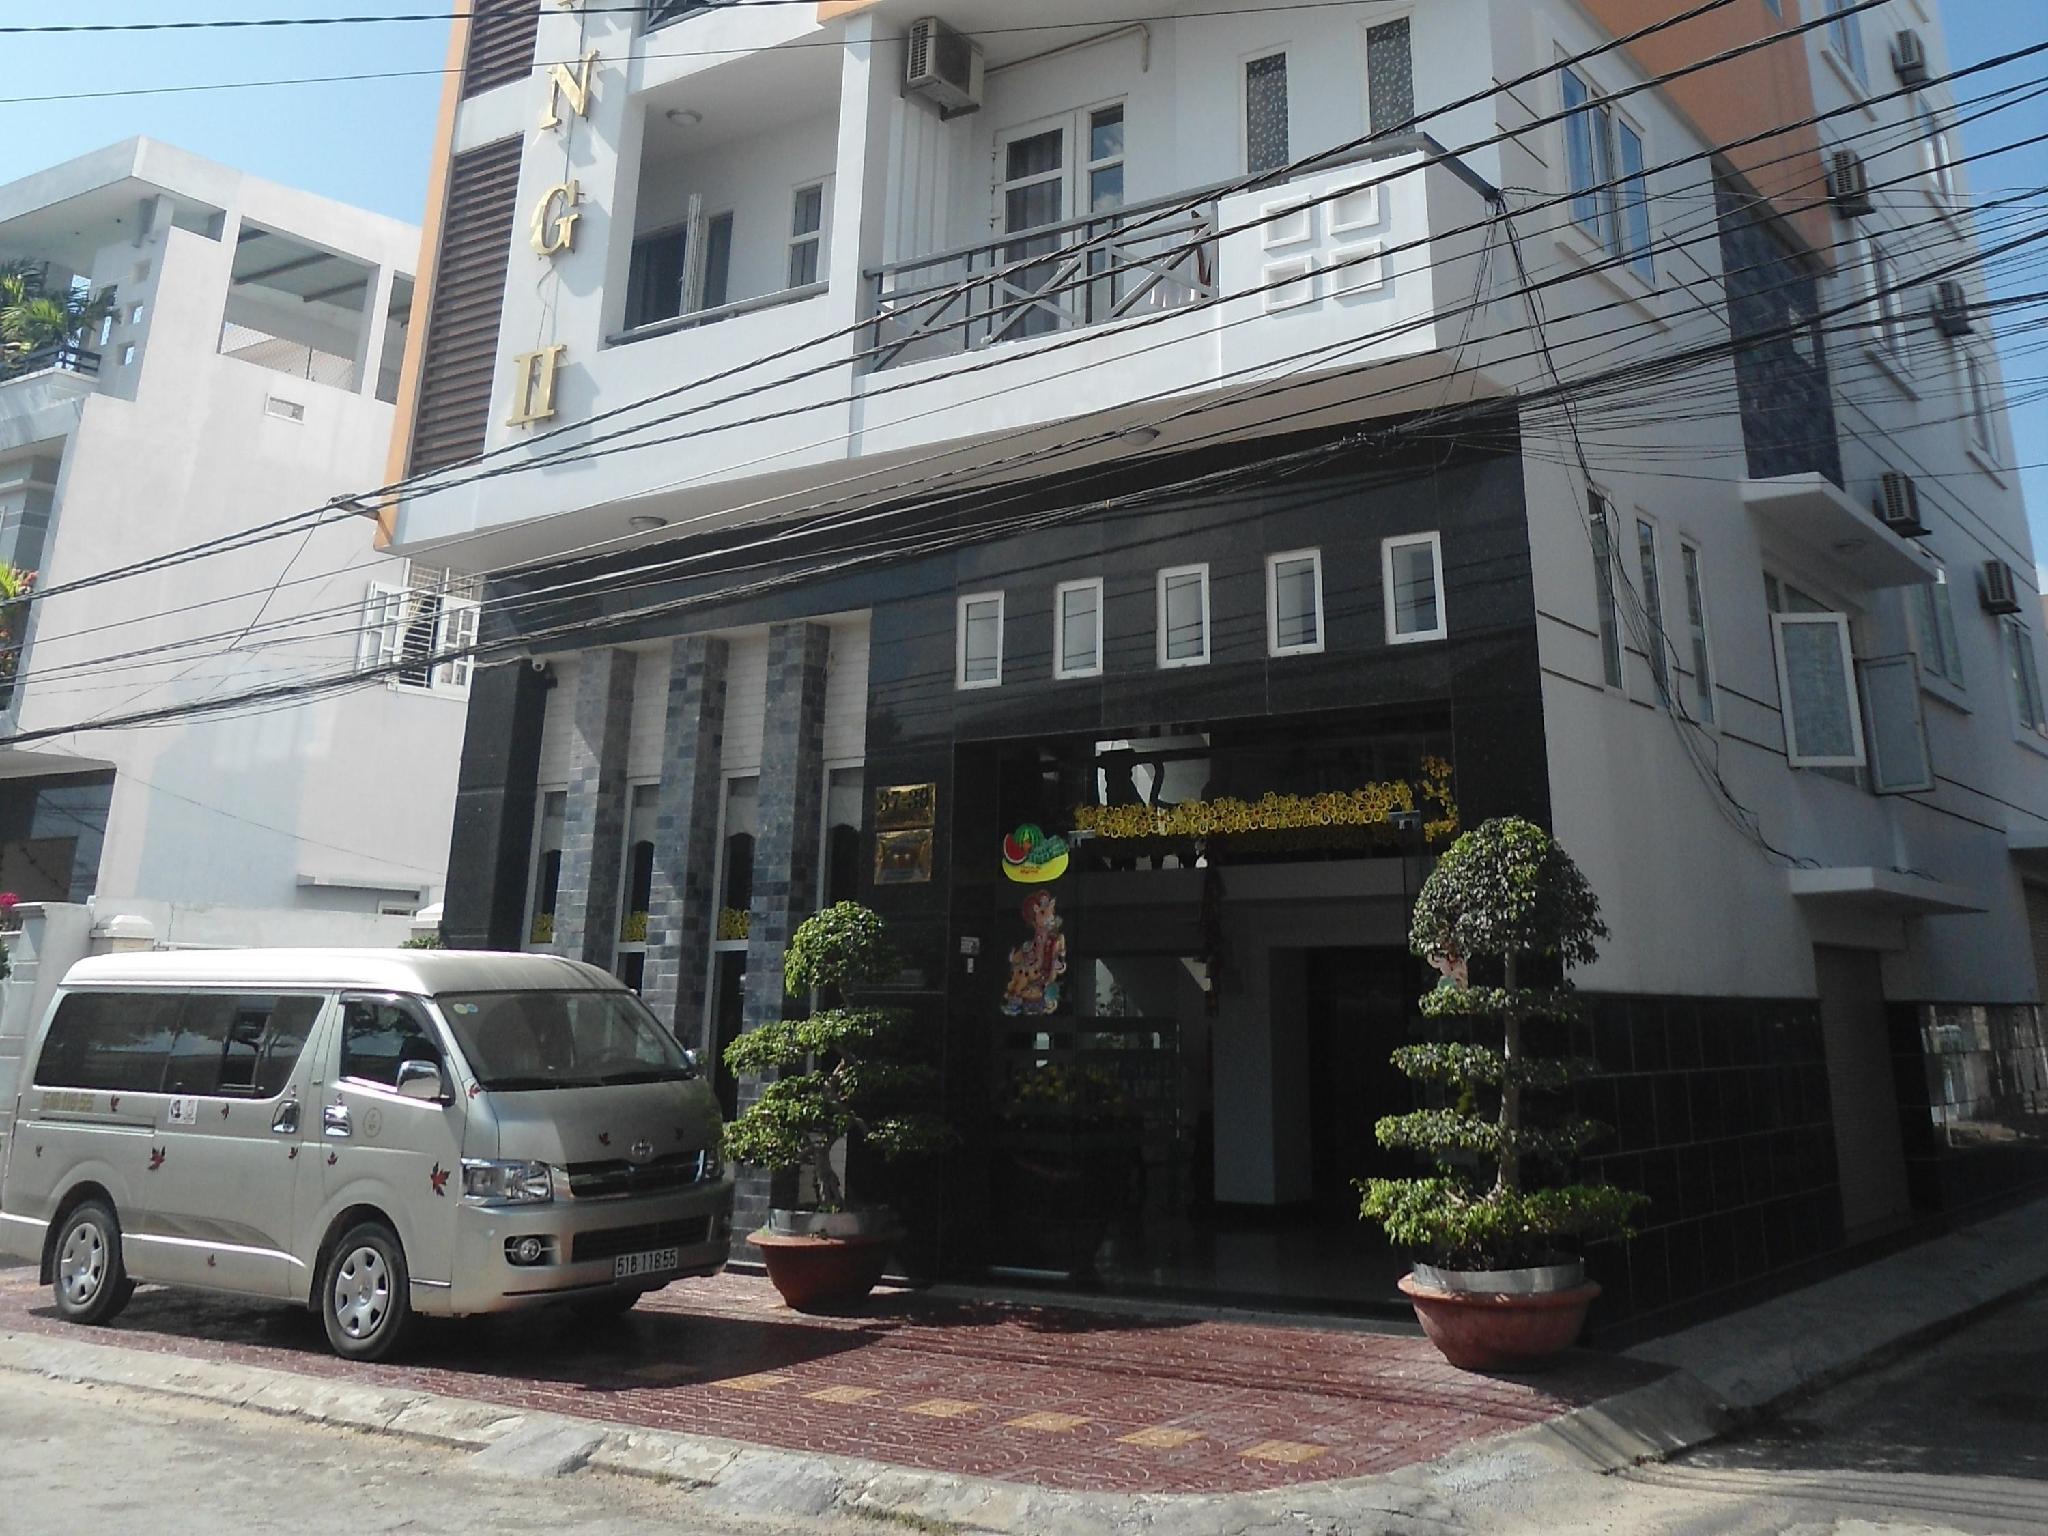 Hotell Khang Khang 2 Hotel